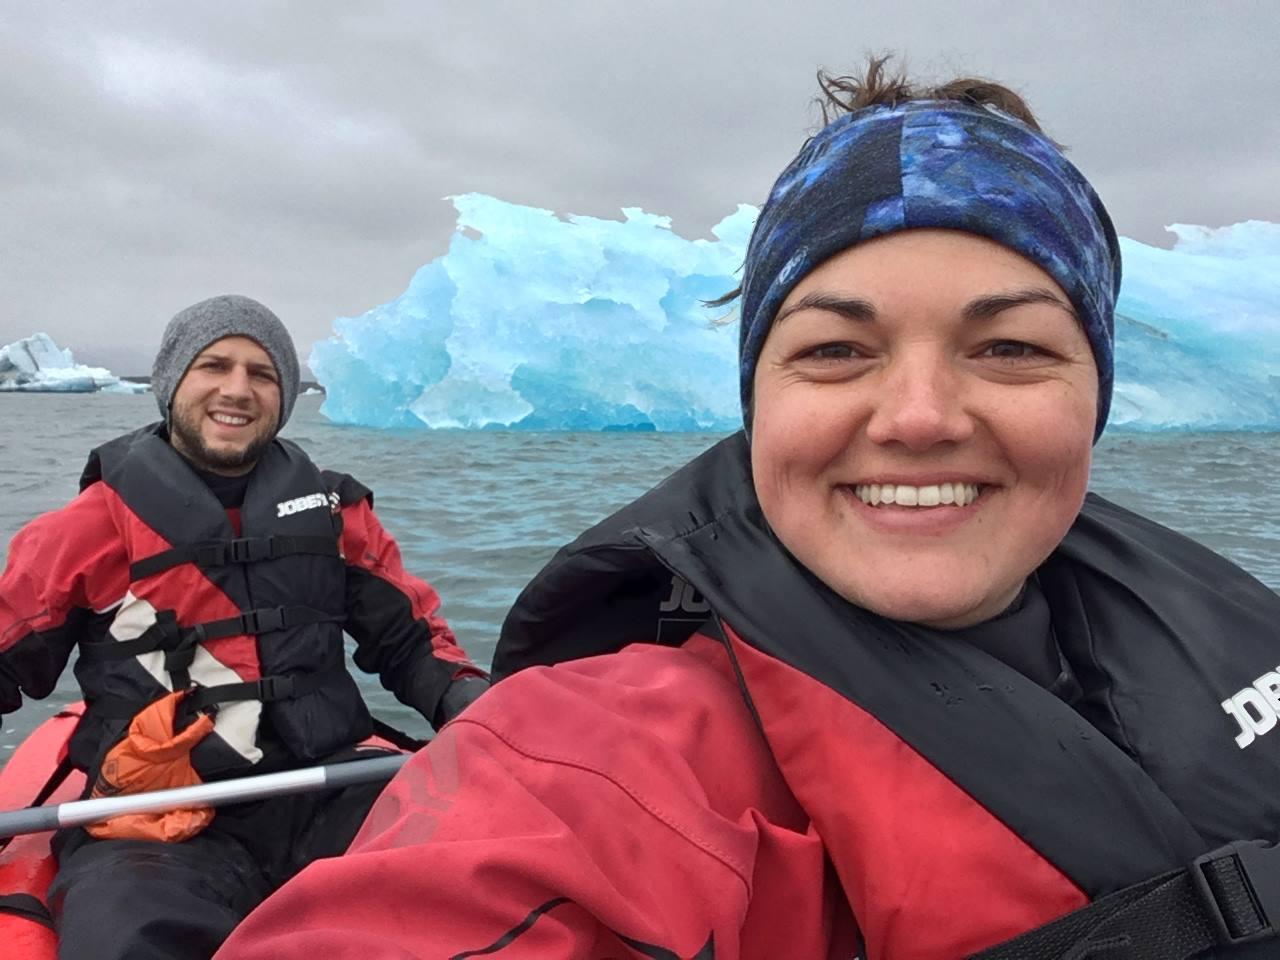 My last international trip before arriving in Denver, kayaking around icebergs in Iceland with colleague/friend Matt Cook